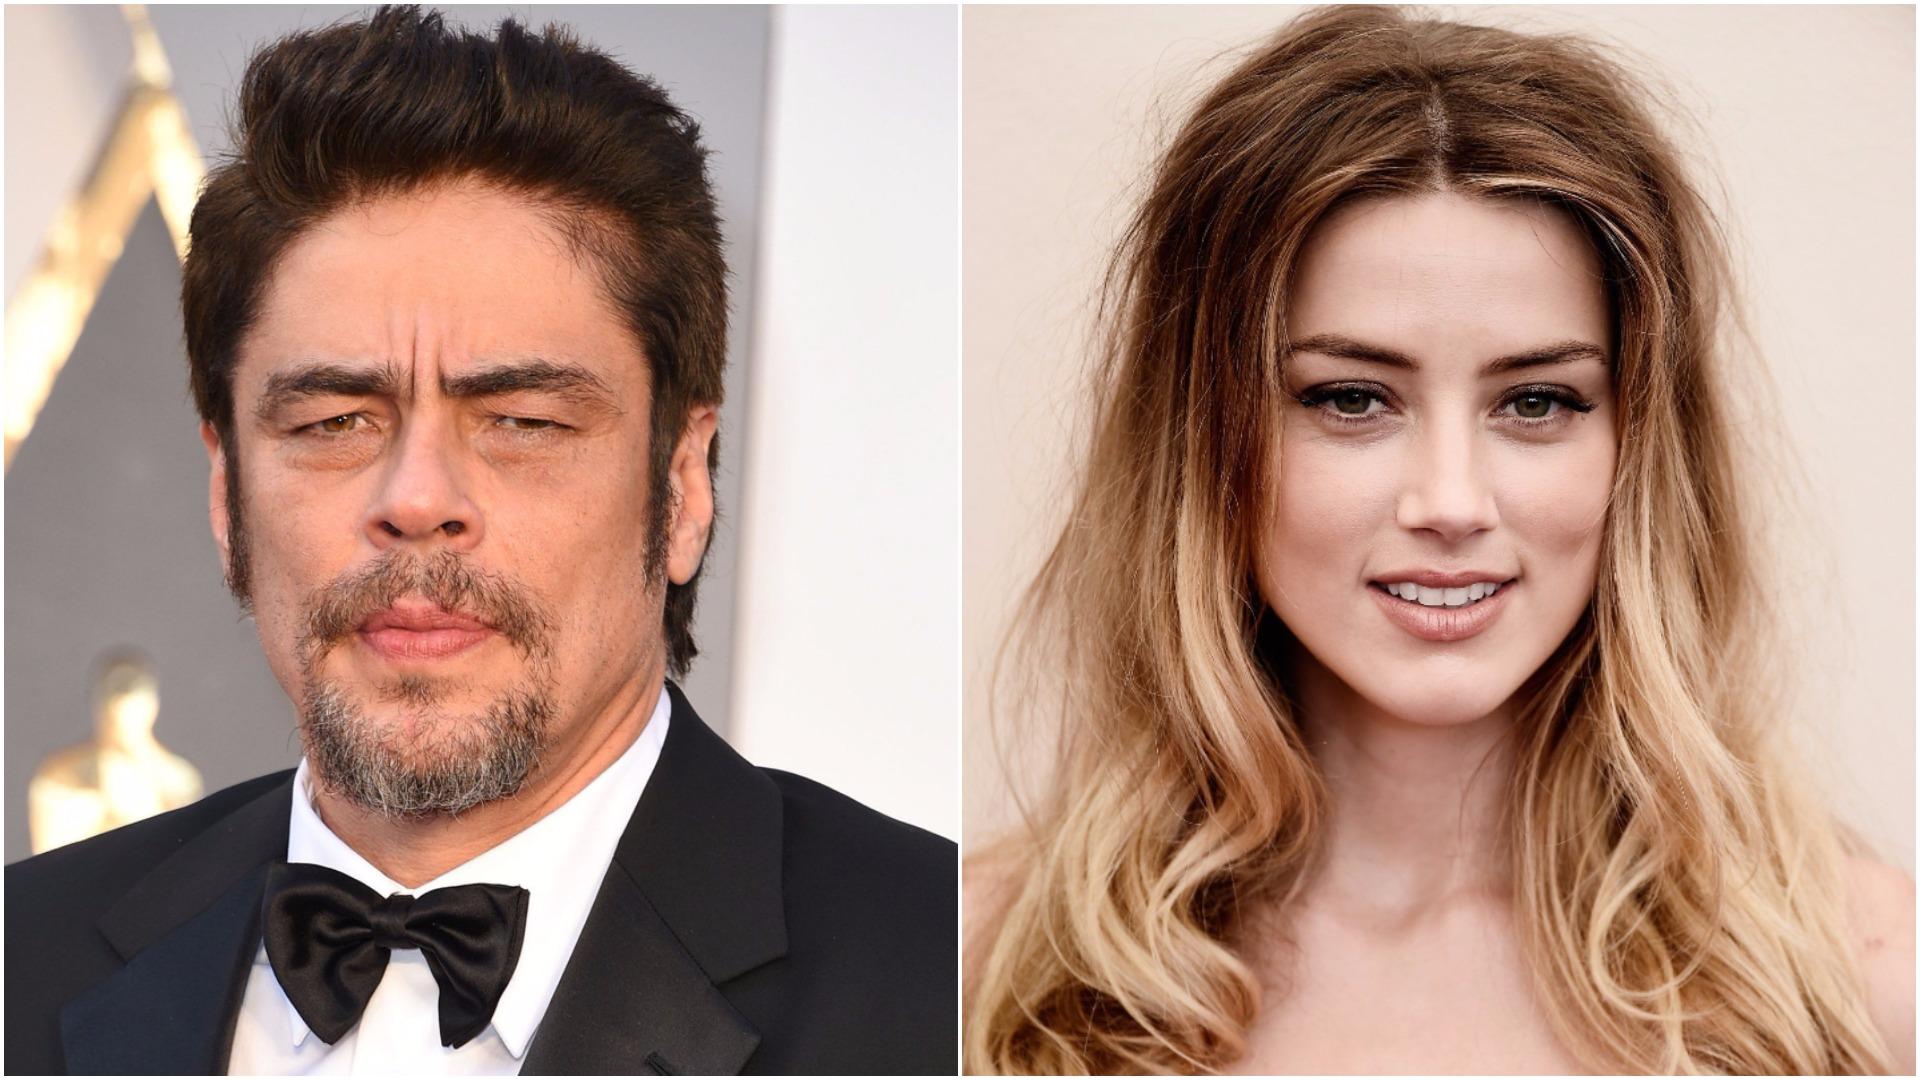 Benicio del Toro has said some shocking things about Amber Heard